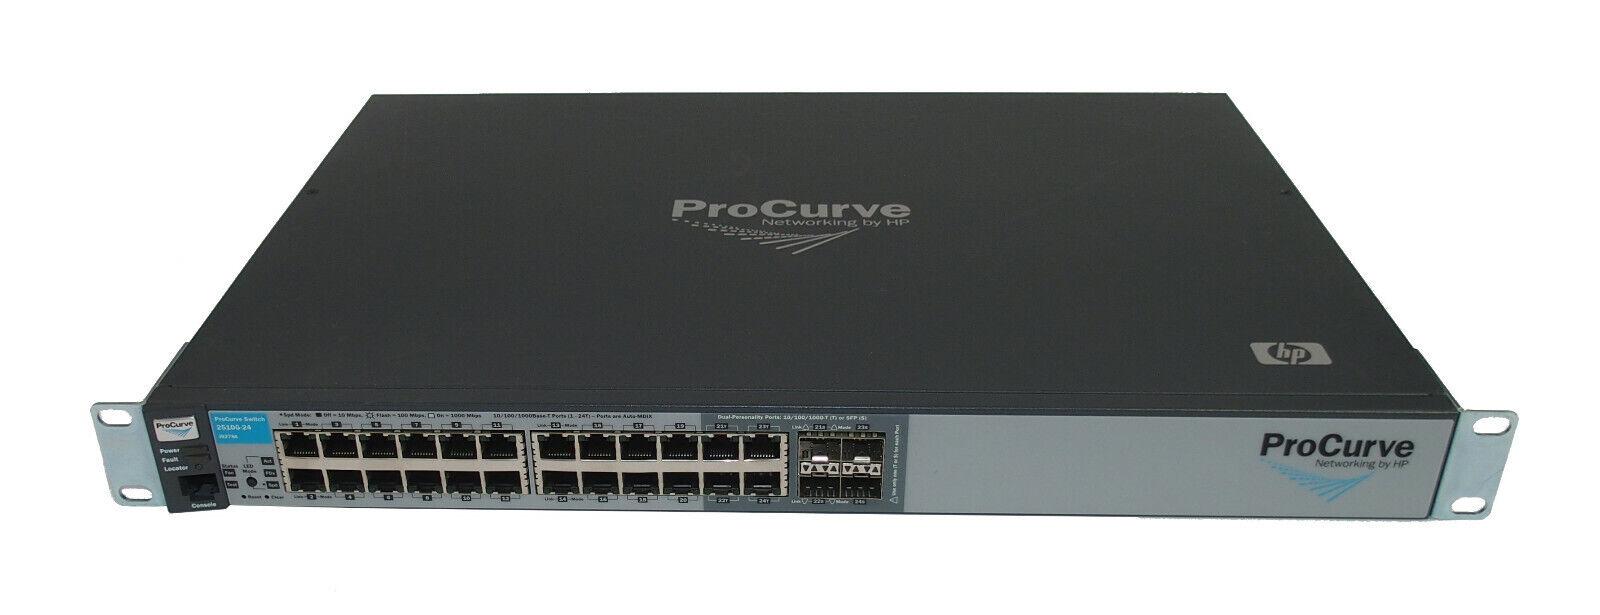 HP J9279A ProCurve 2510G-24 24-Port Gigabit Managed Ethernet Switch 6MthWty